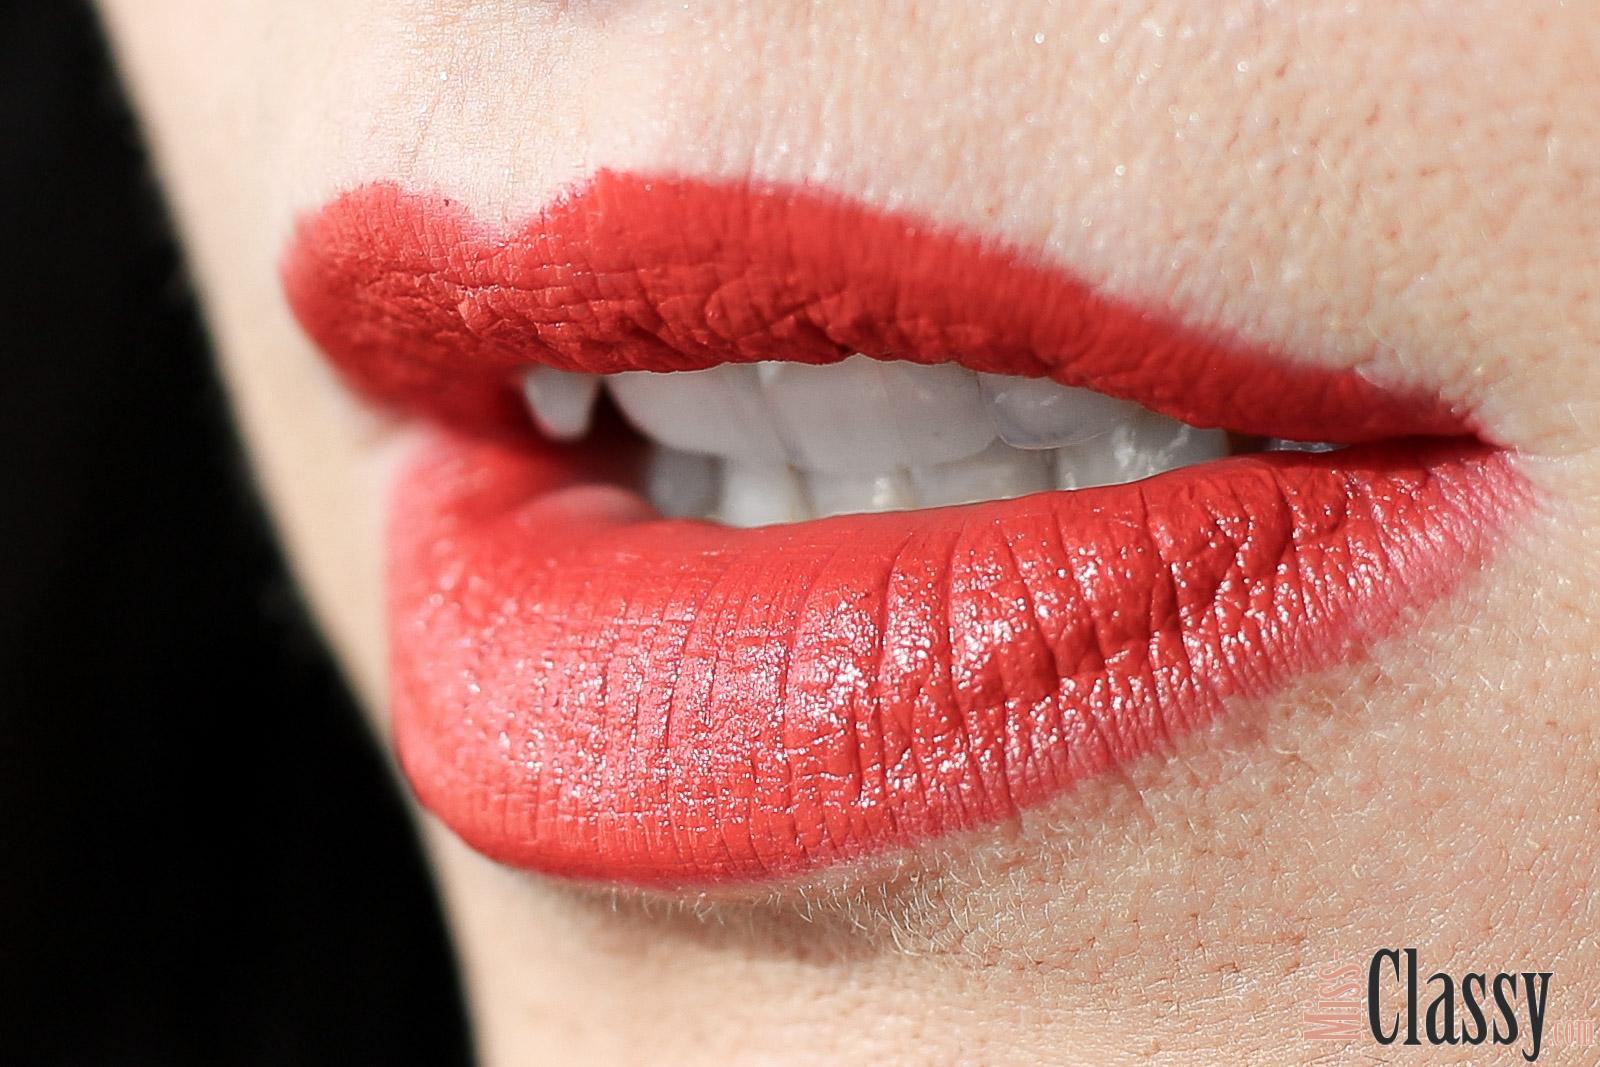 BEAUTY: MAC Cosmetics Lippenstift - Lady Danger, Miss Classy, Grazer Beauty Blog, Lifestyle Blog, Bloggerin Graz, Beauty, Kosmetik, Lippenstift, MAC Cosmetics, Lady Danger, Matte Finish, Lippenstift Tragefoto, Lippen, Korallroter Lippenstift